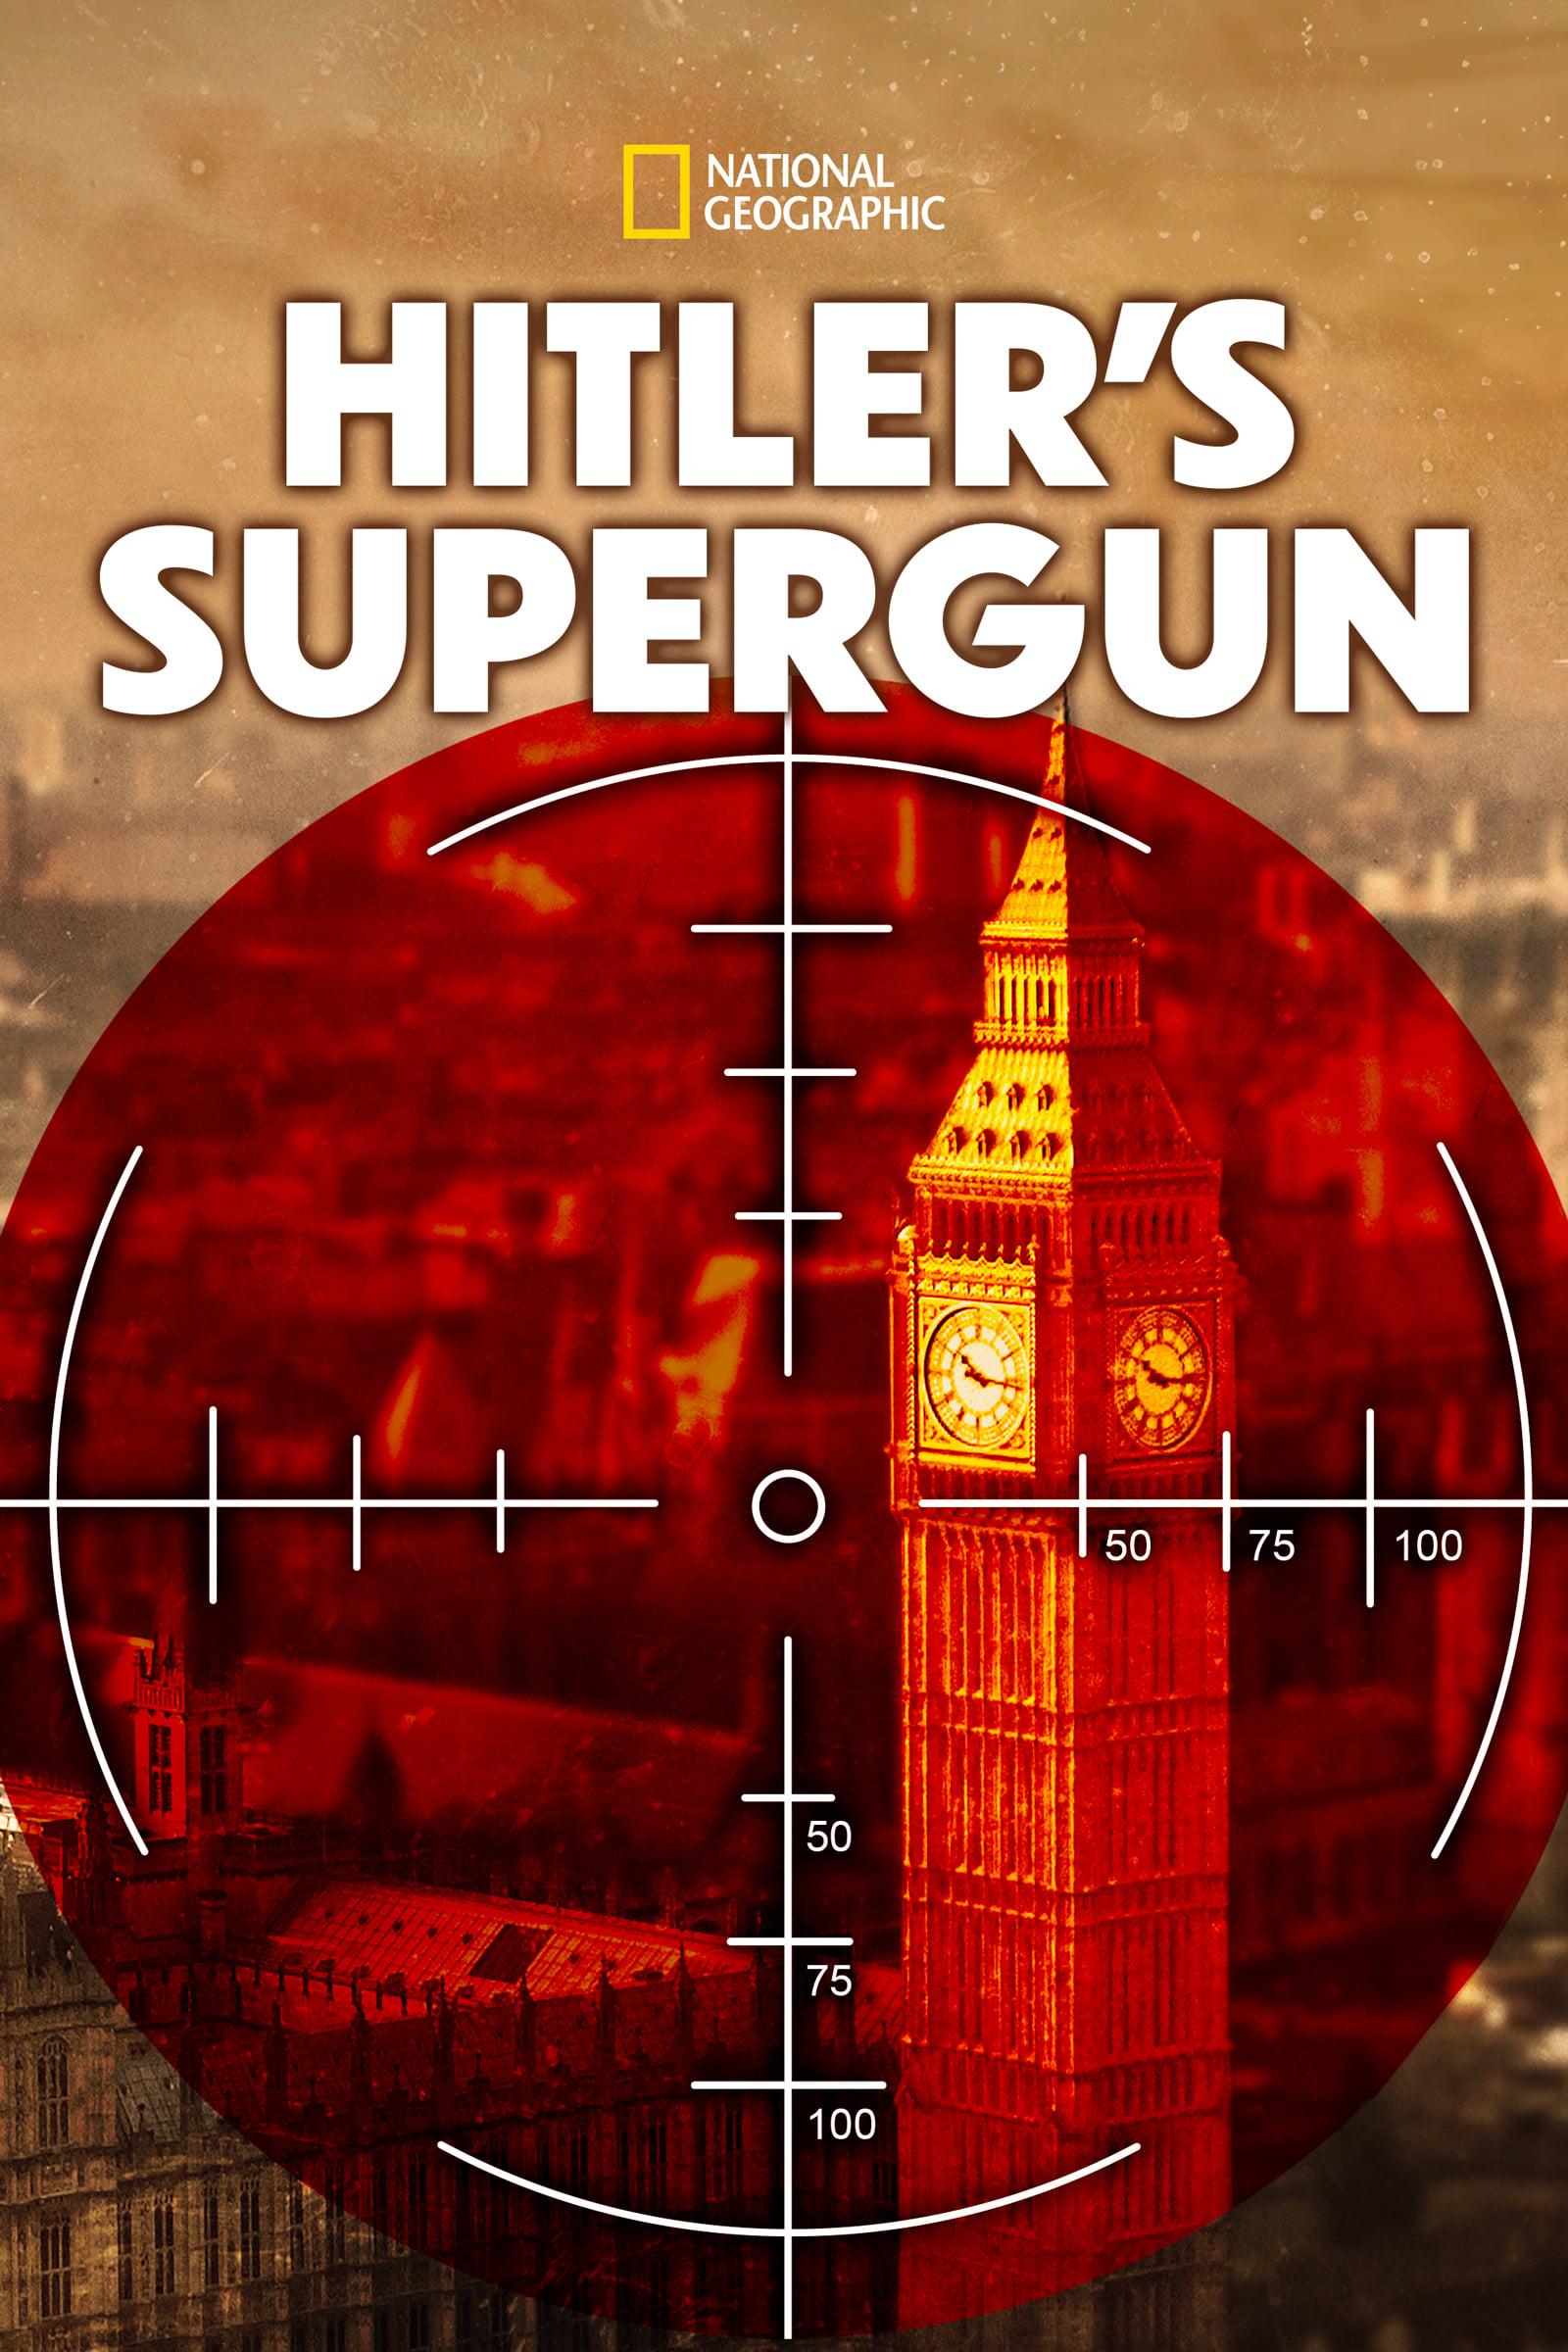 Hitler's Supergun